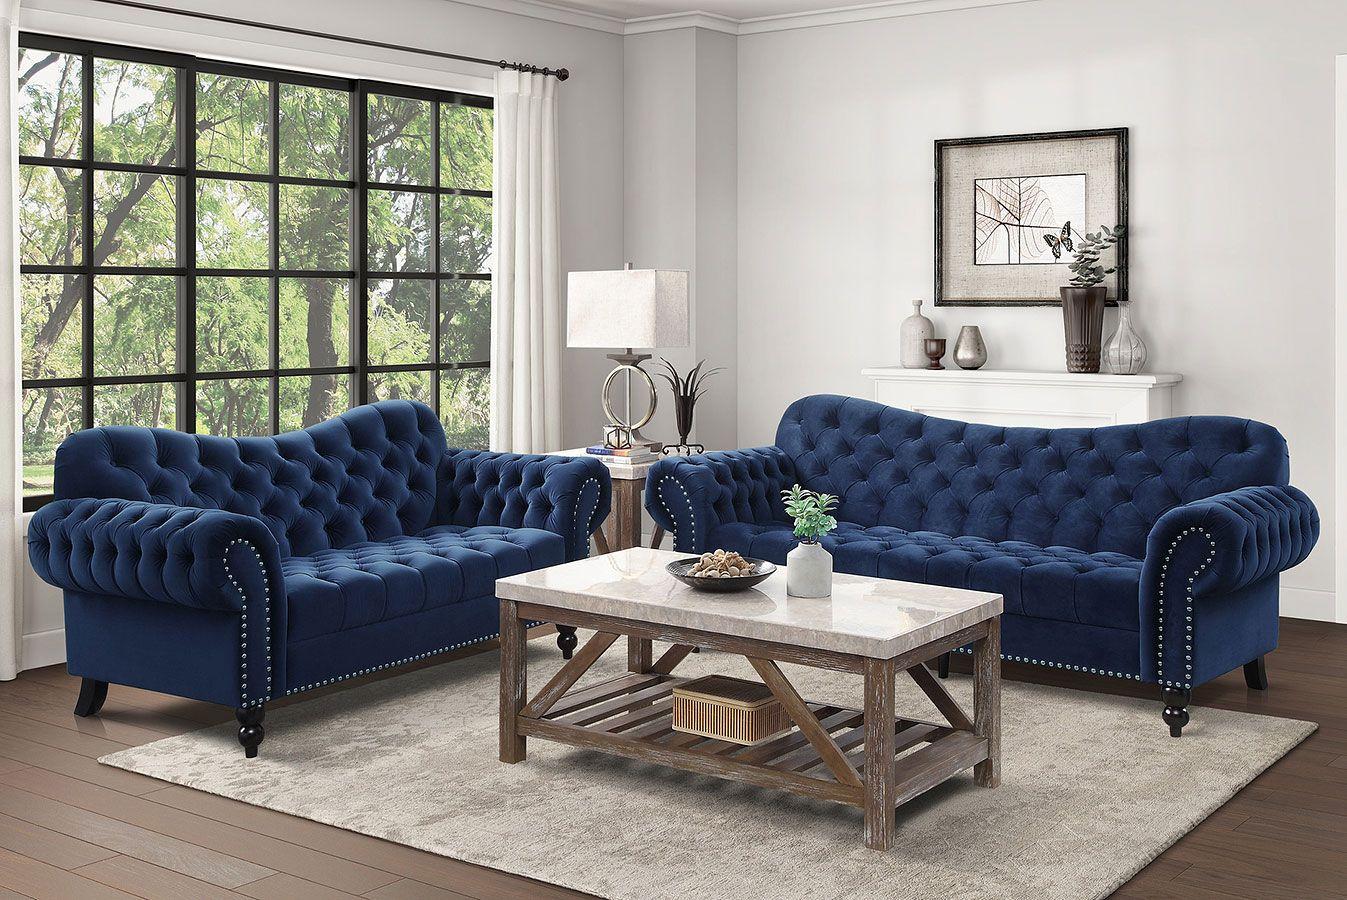 Rosalie Living Room Set Navy Blue Living Room Sets Living Room Pieces Comfortable Furniture